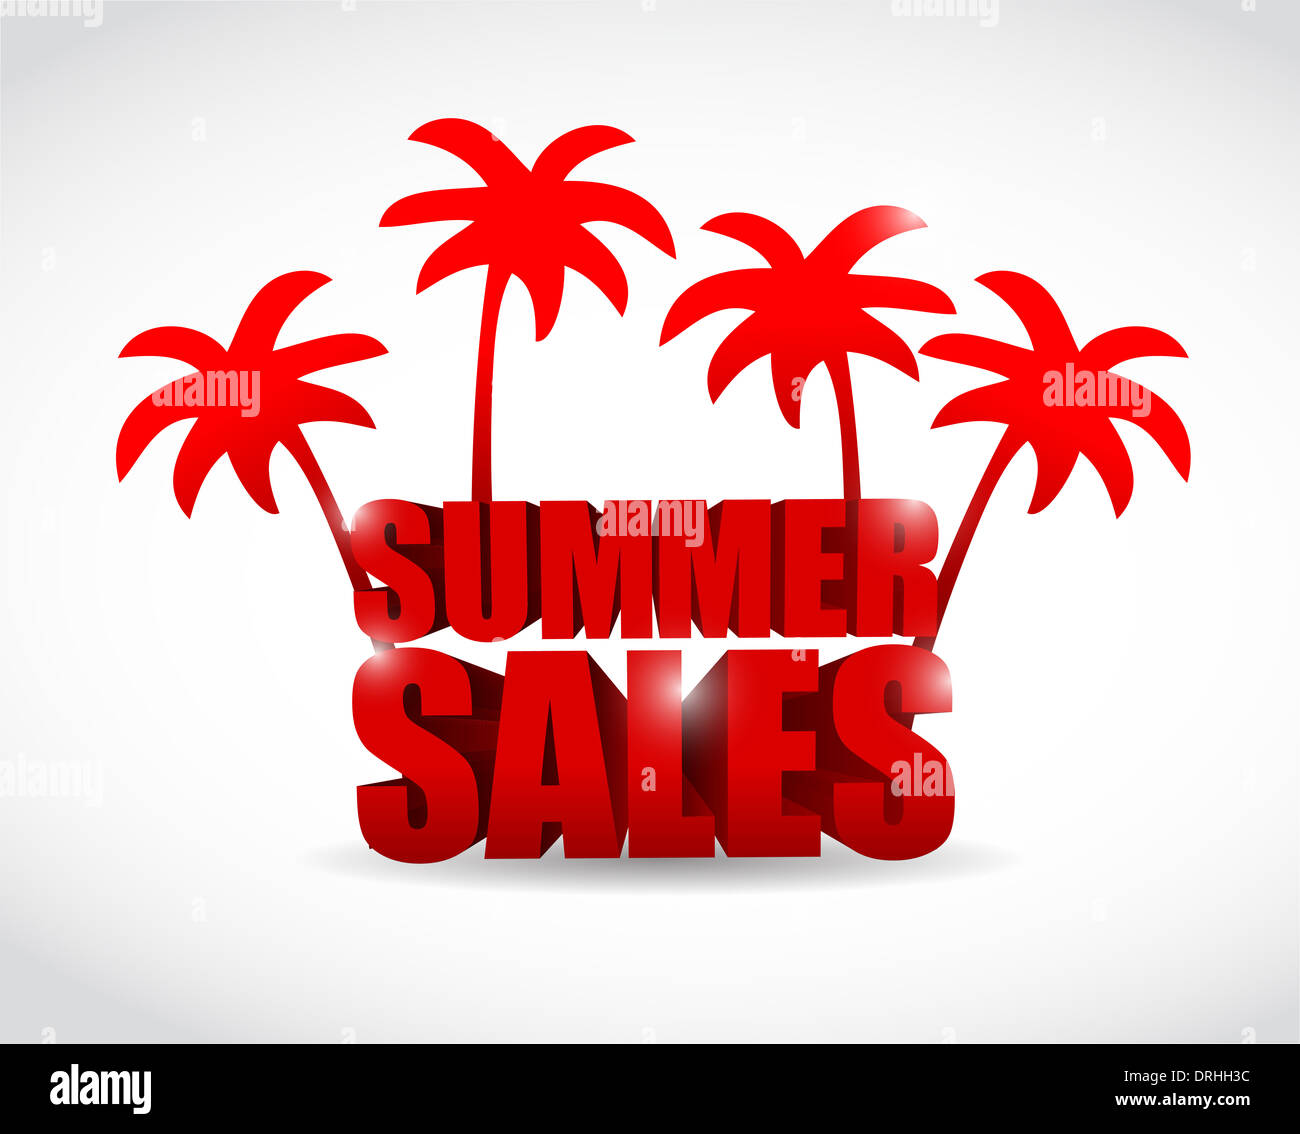 summer sale sign illustration design over a white background stock